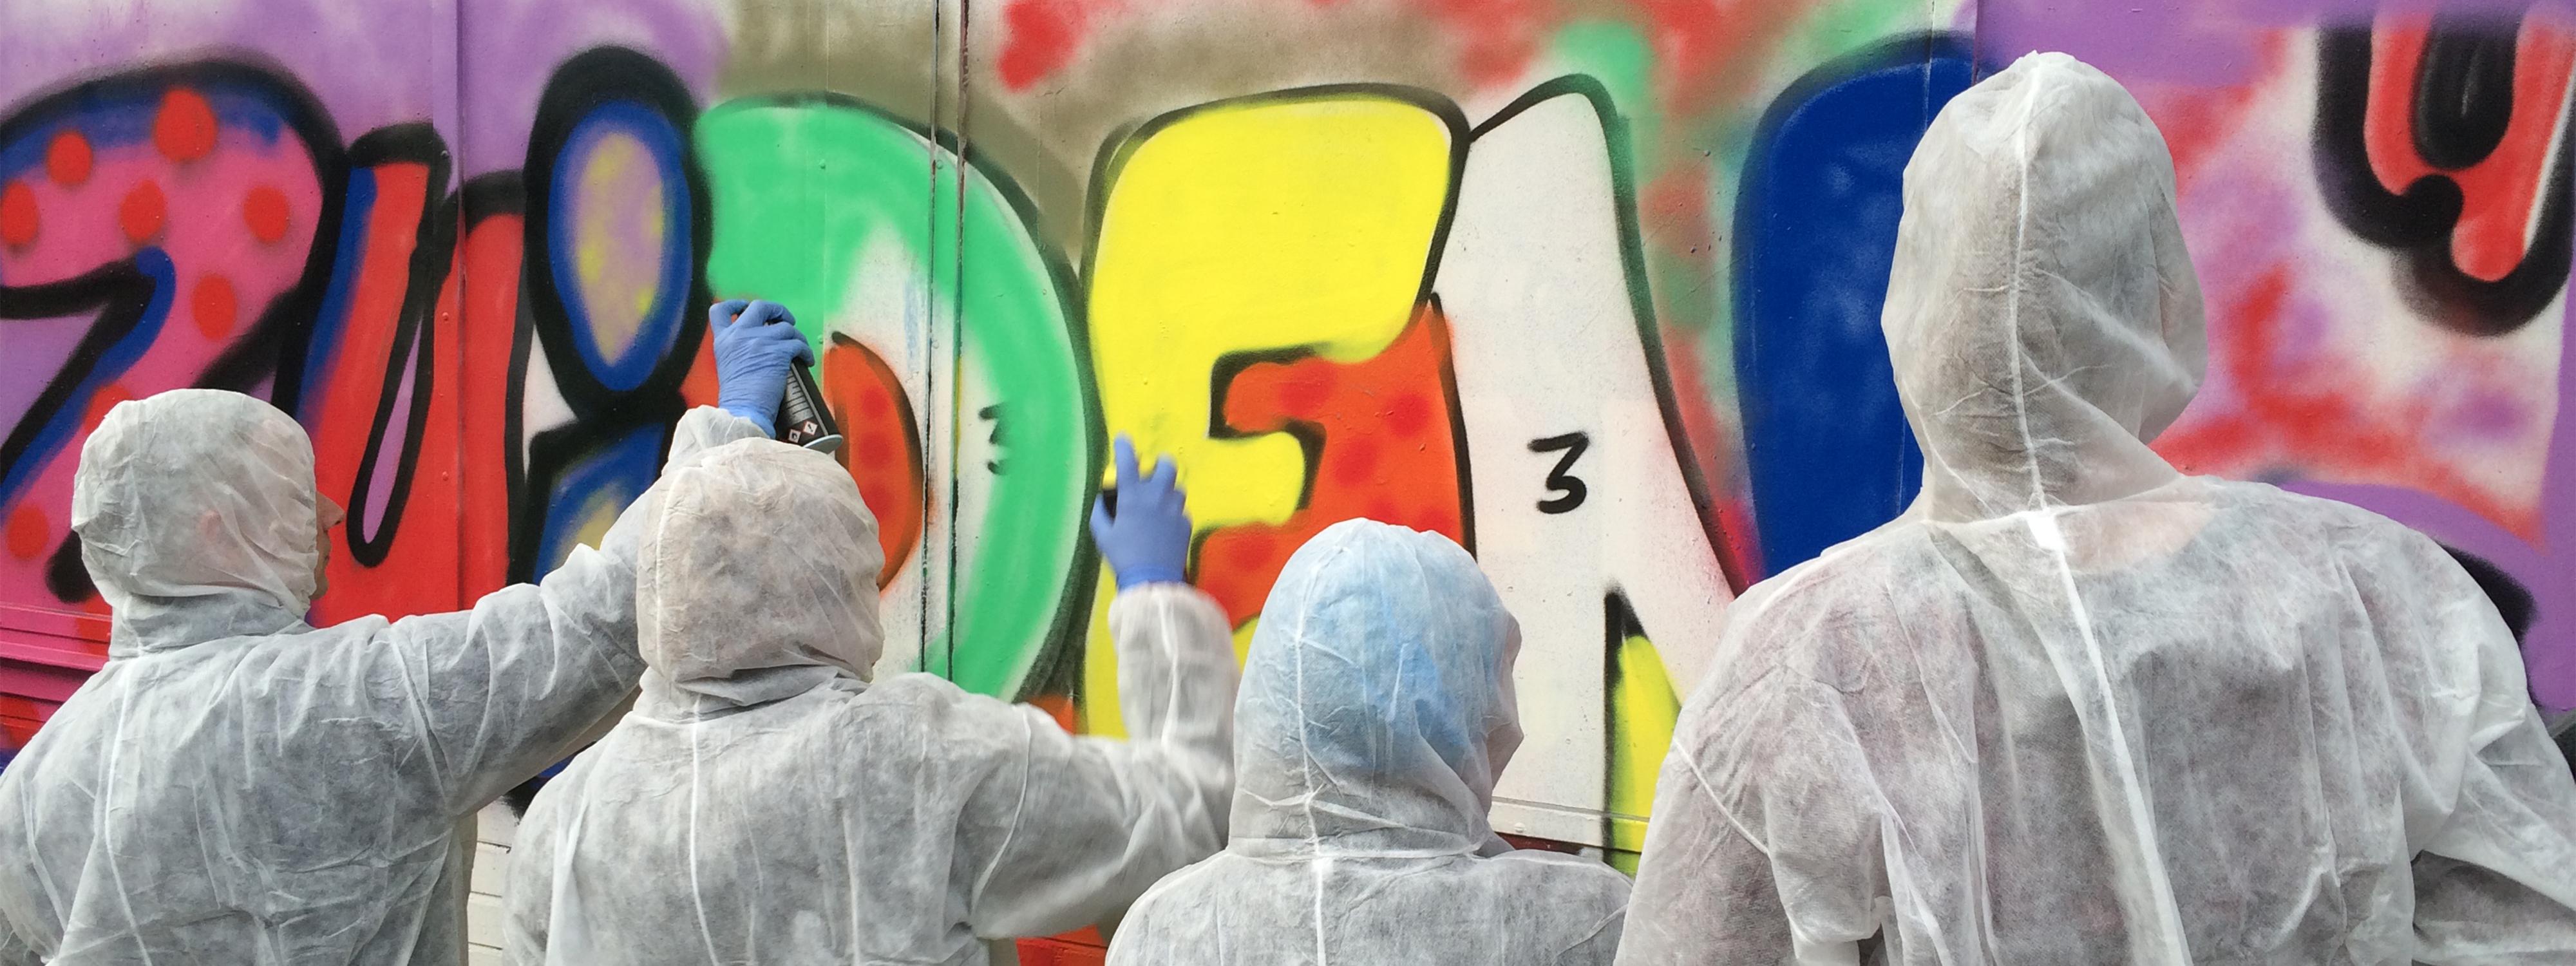 teamuitje-den-bosch-workshop-crazy-art